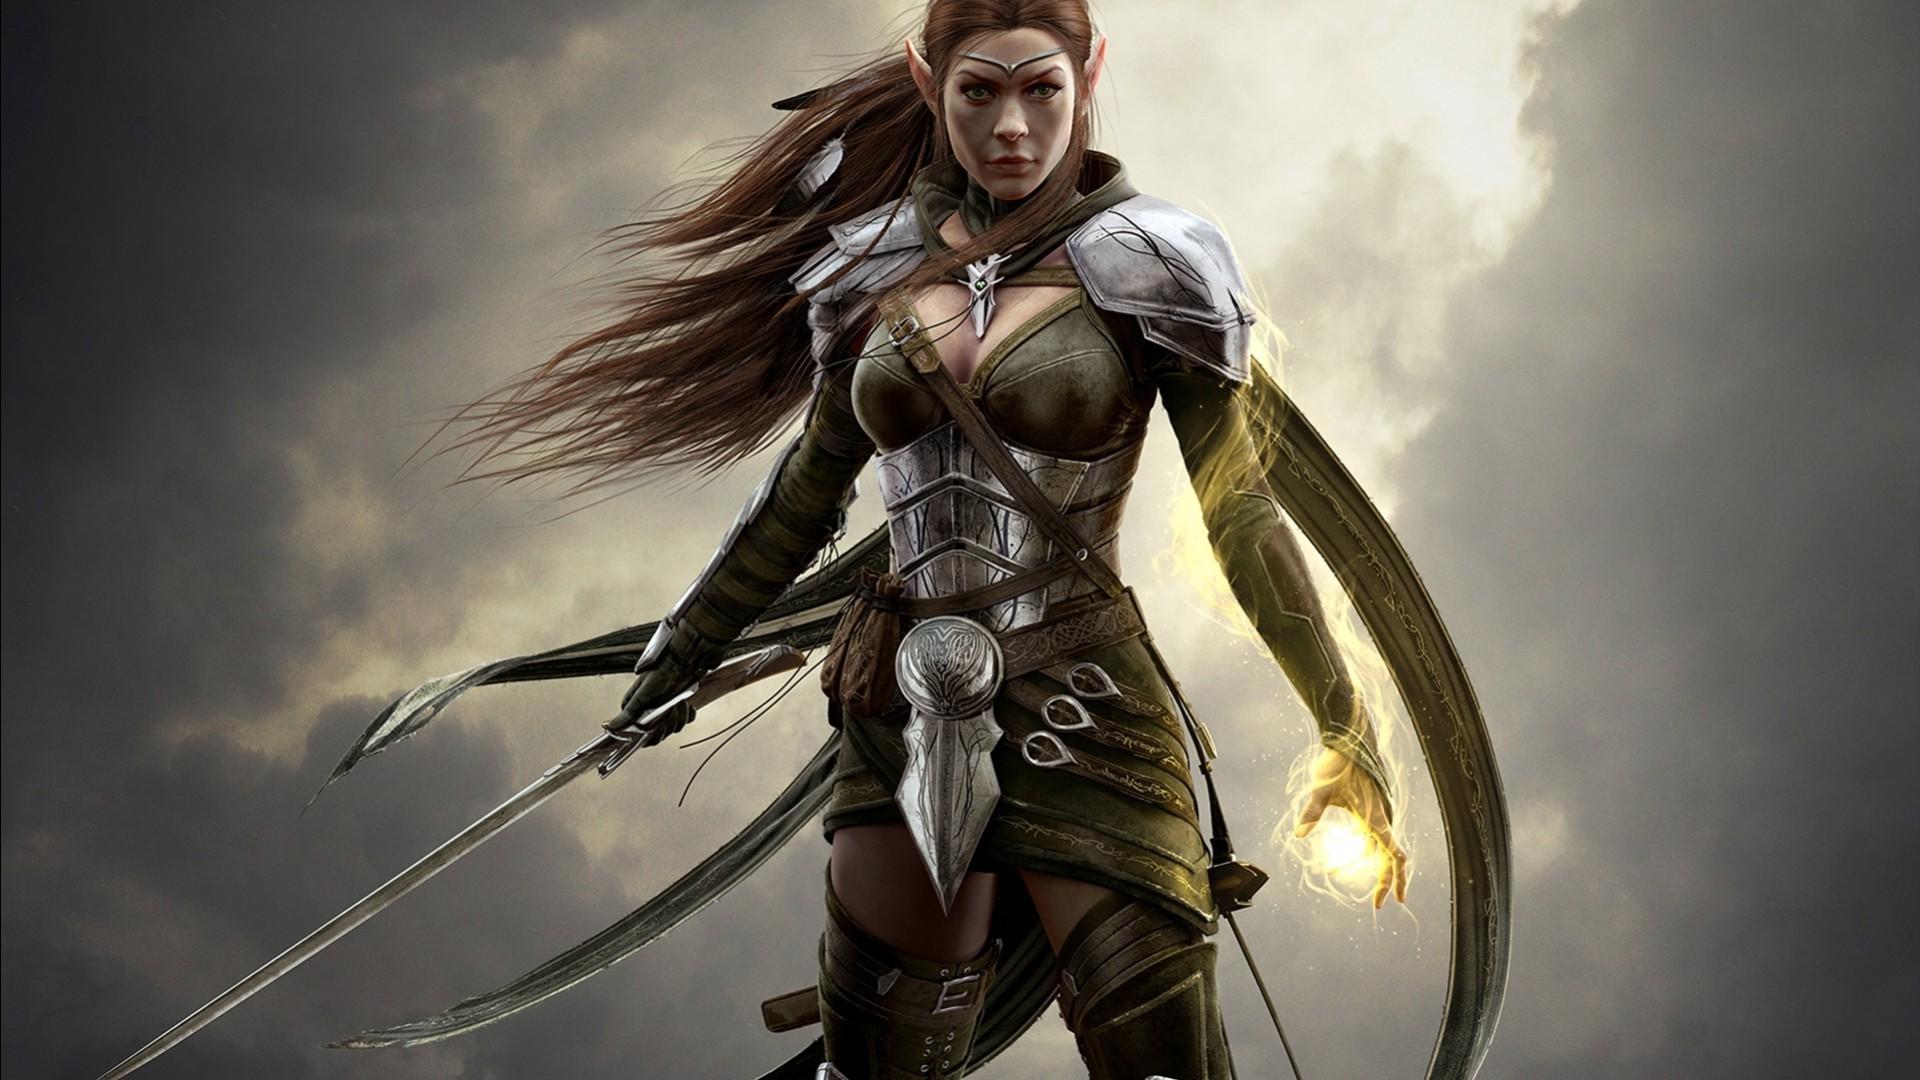 The Elder Scrolls Online Morrowind wallpapers or desktop backgrounds